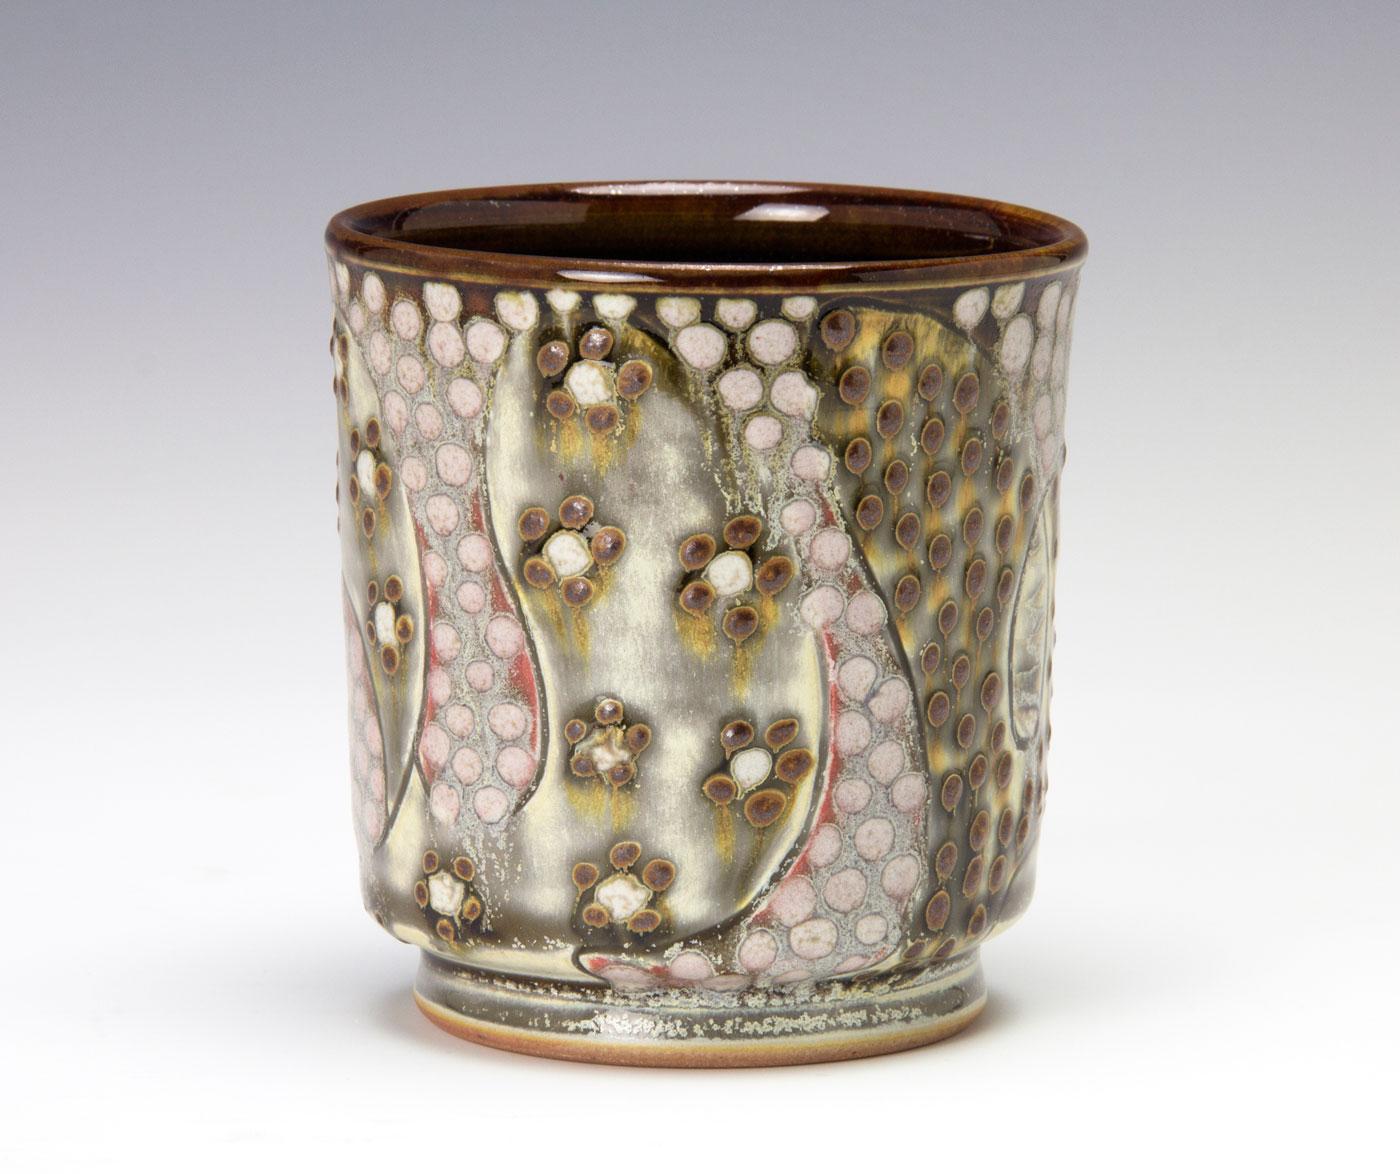 Pattern-Medley-studio-Art-cup-Samantha-Henneke-Bulldog-Pottery-Seagrove-NC.jpg